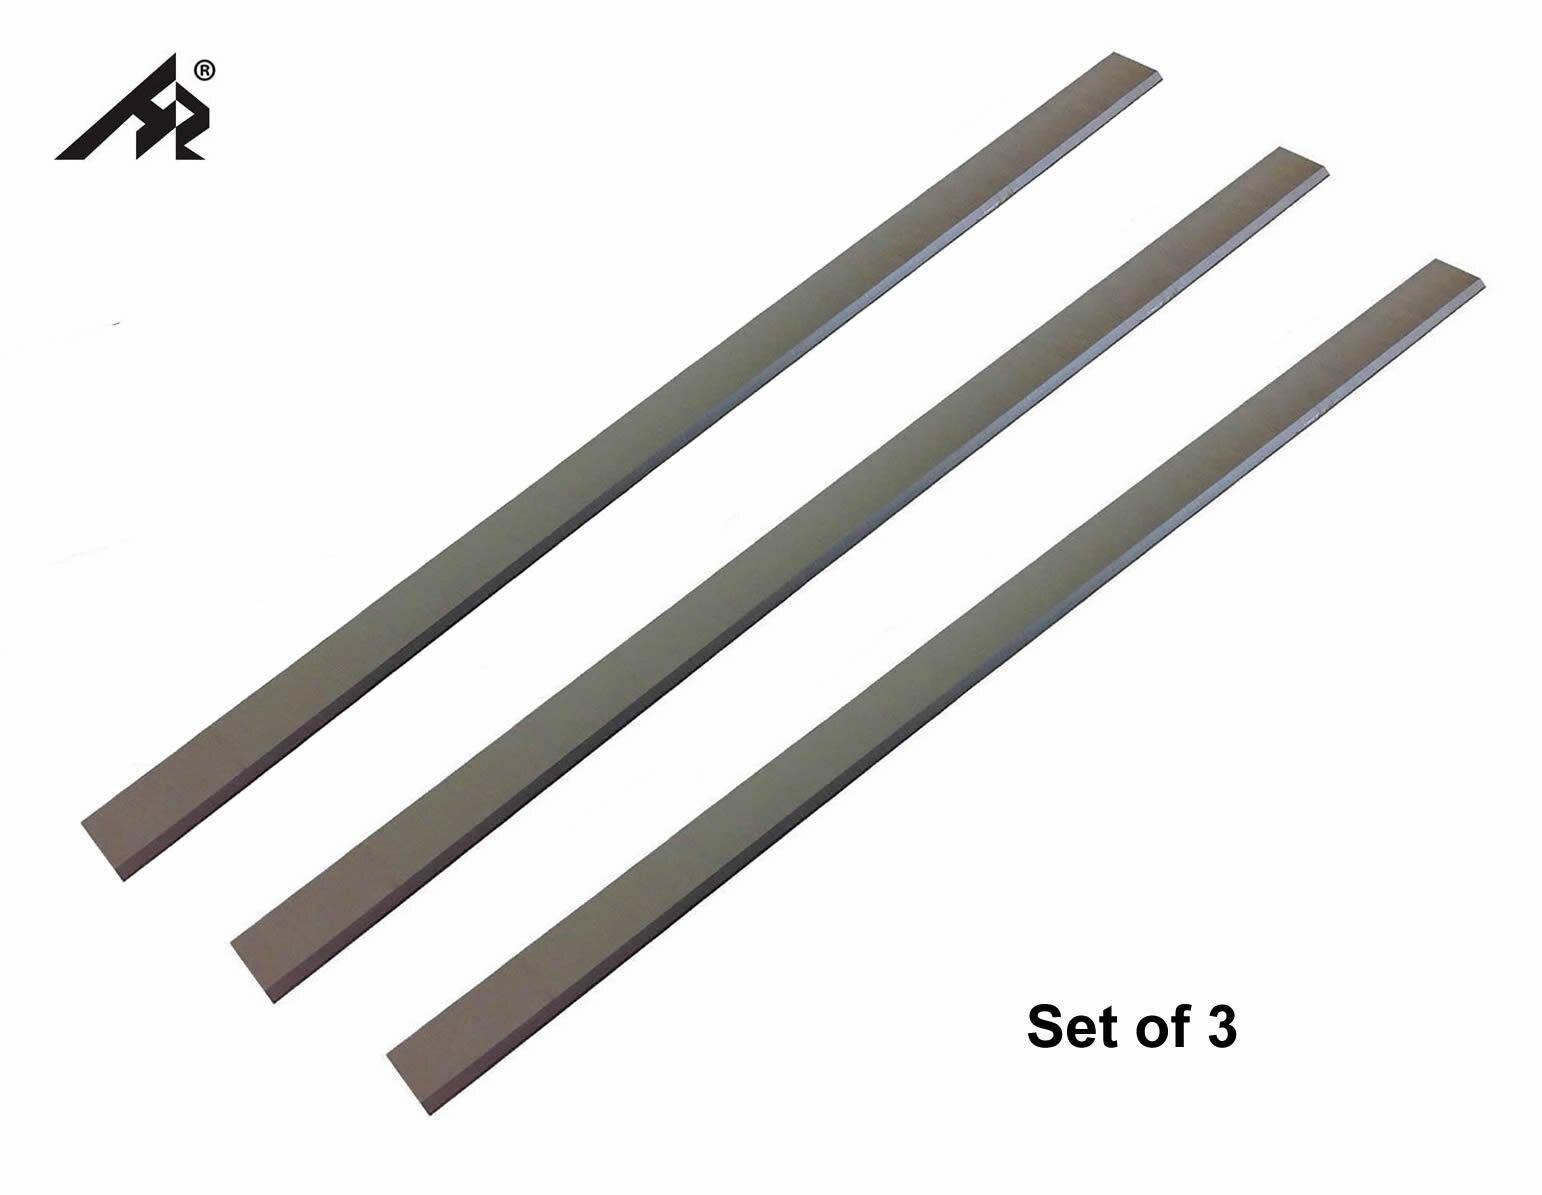 "HZ 13-1/16 ""HSS Jointer cepilladora cuchillas para Jet JPM-13 708366, Grizzly 13"" Delta-Juego de 3"